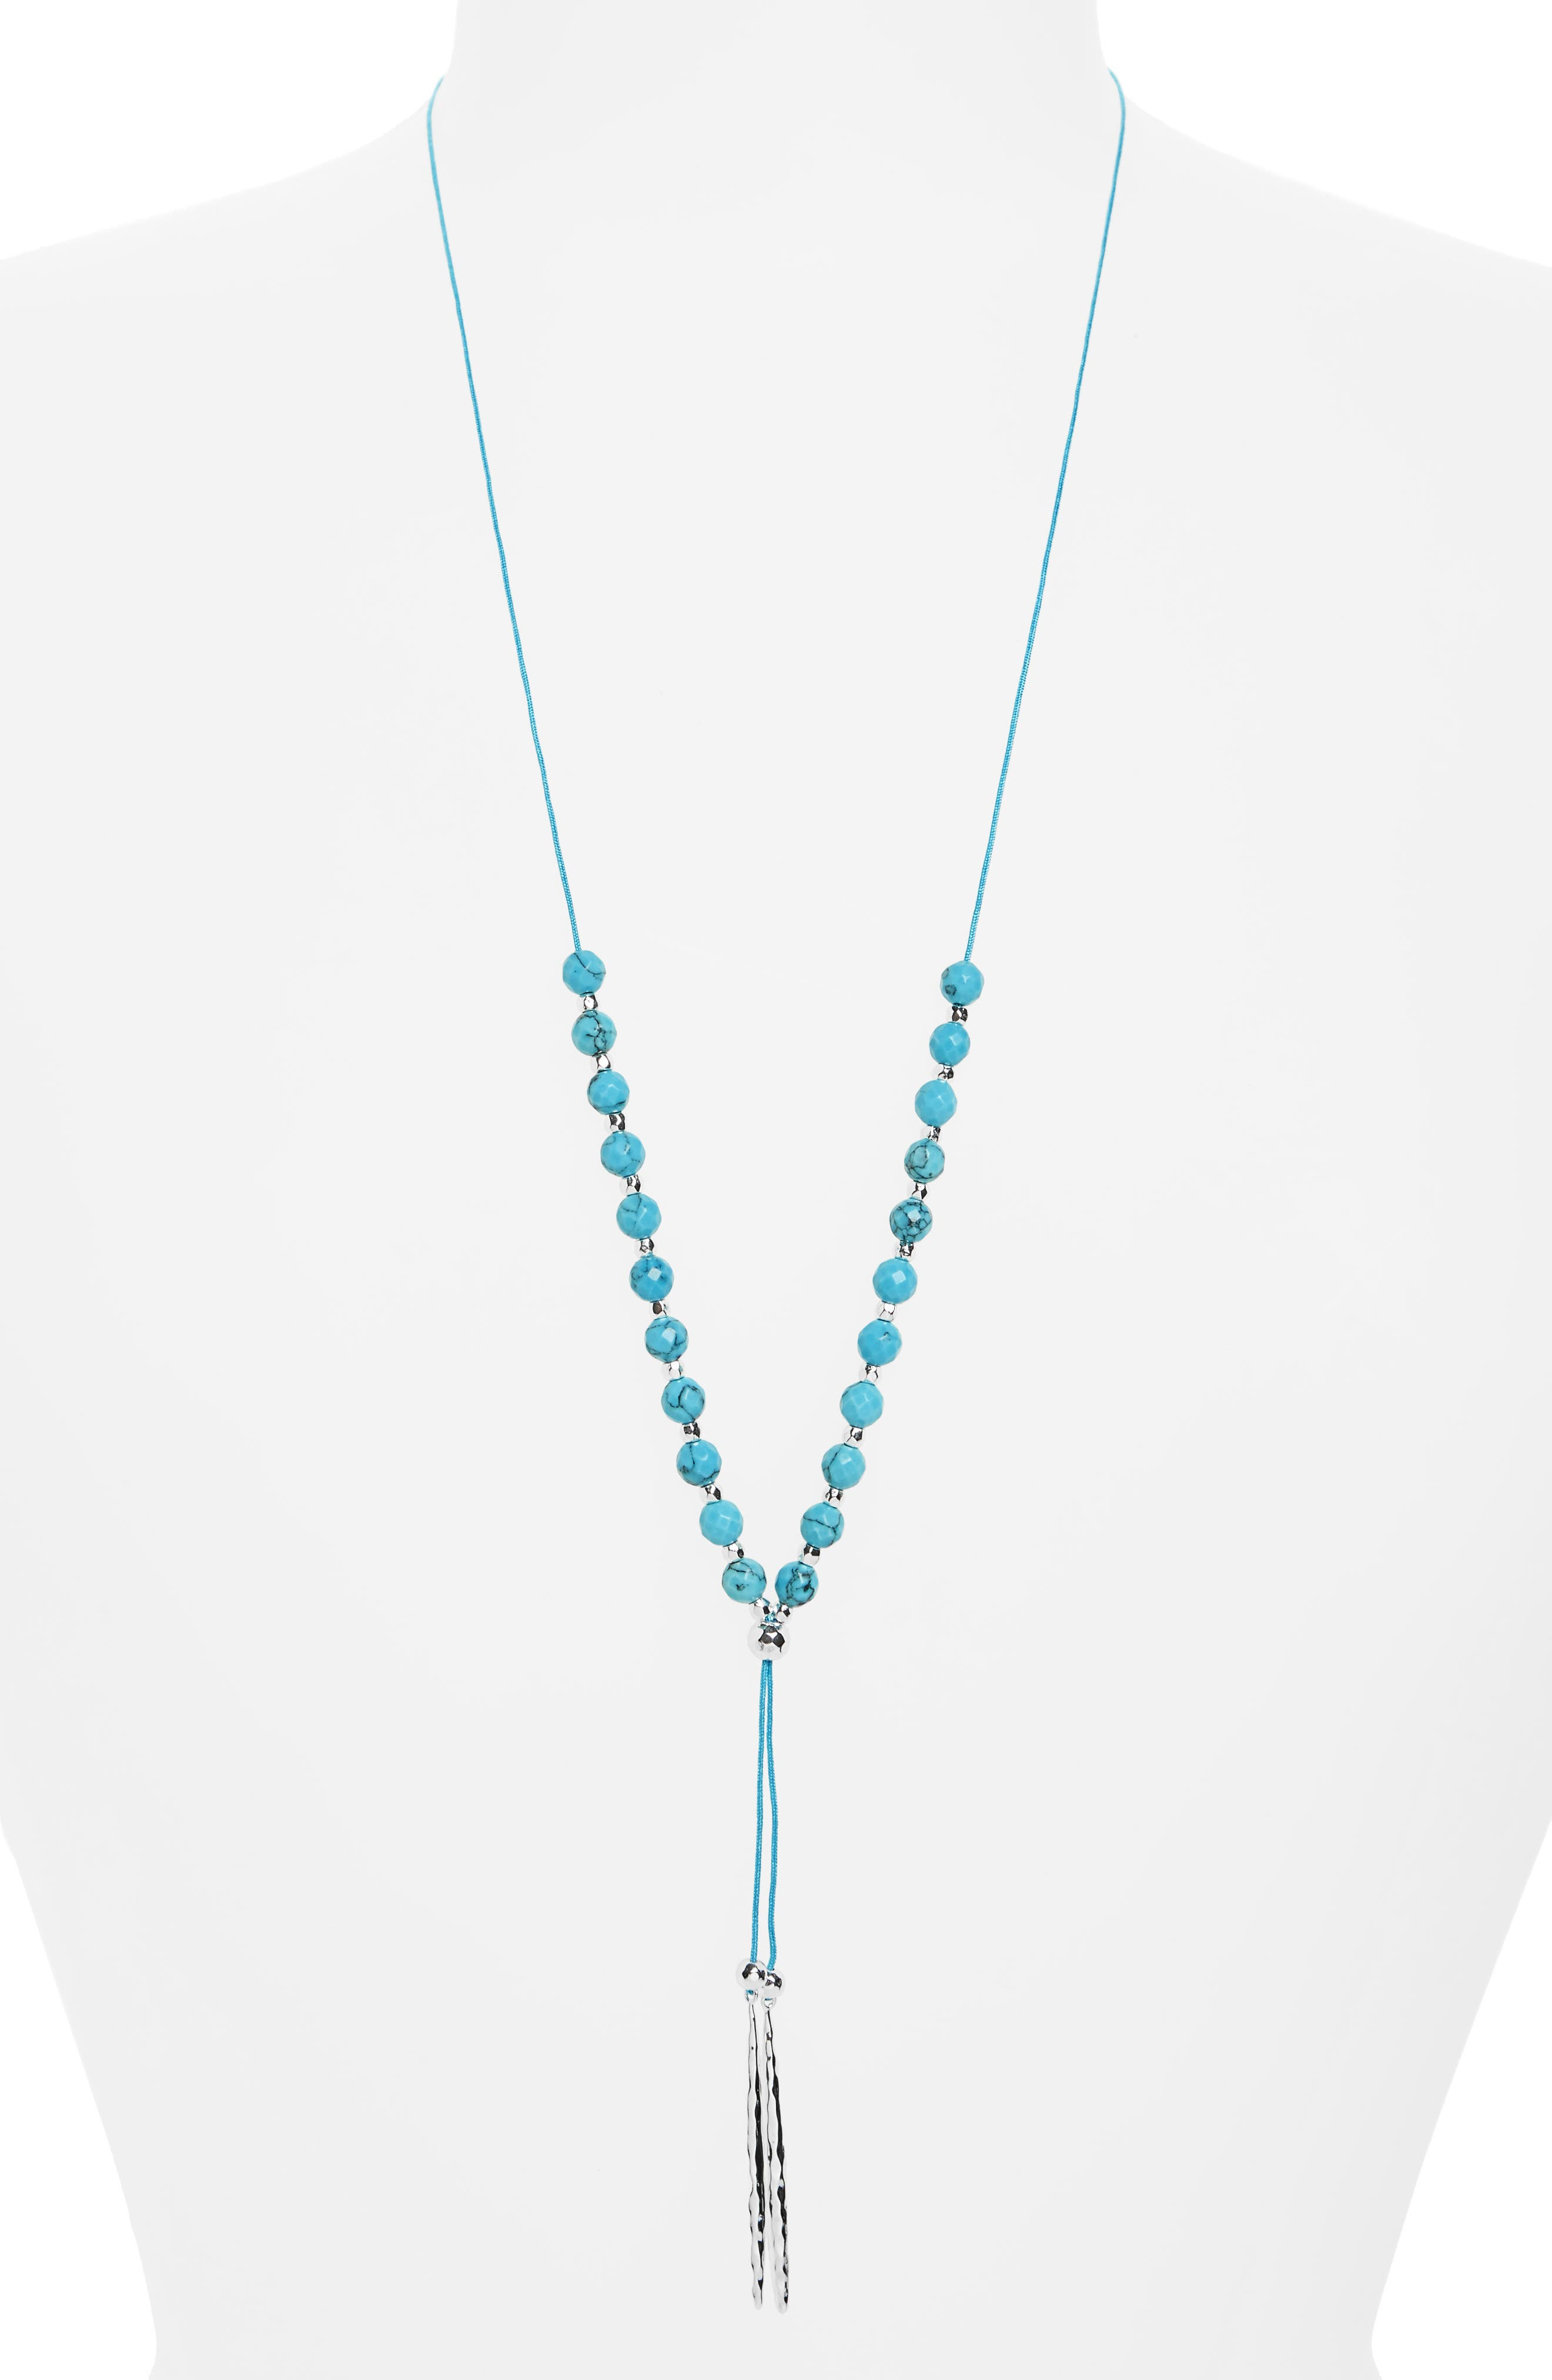 gorjana 'Nora' Long Beaded Pendant Necklace